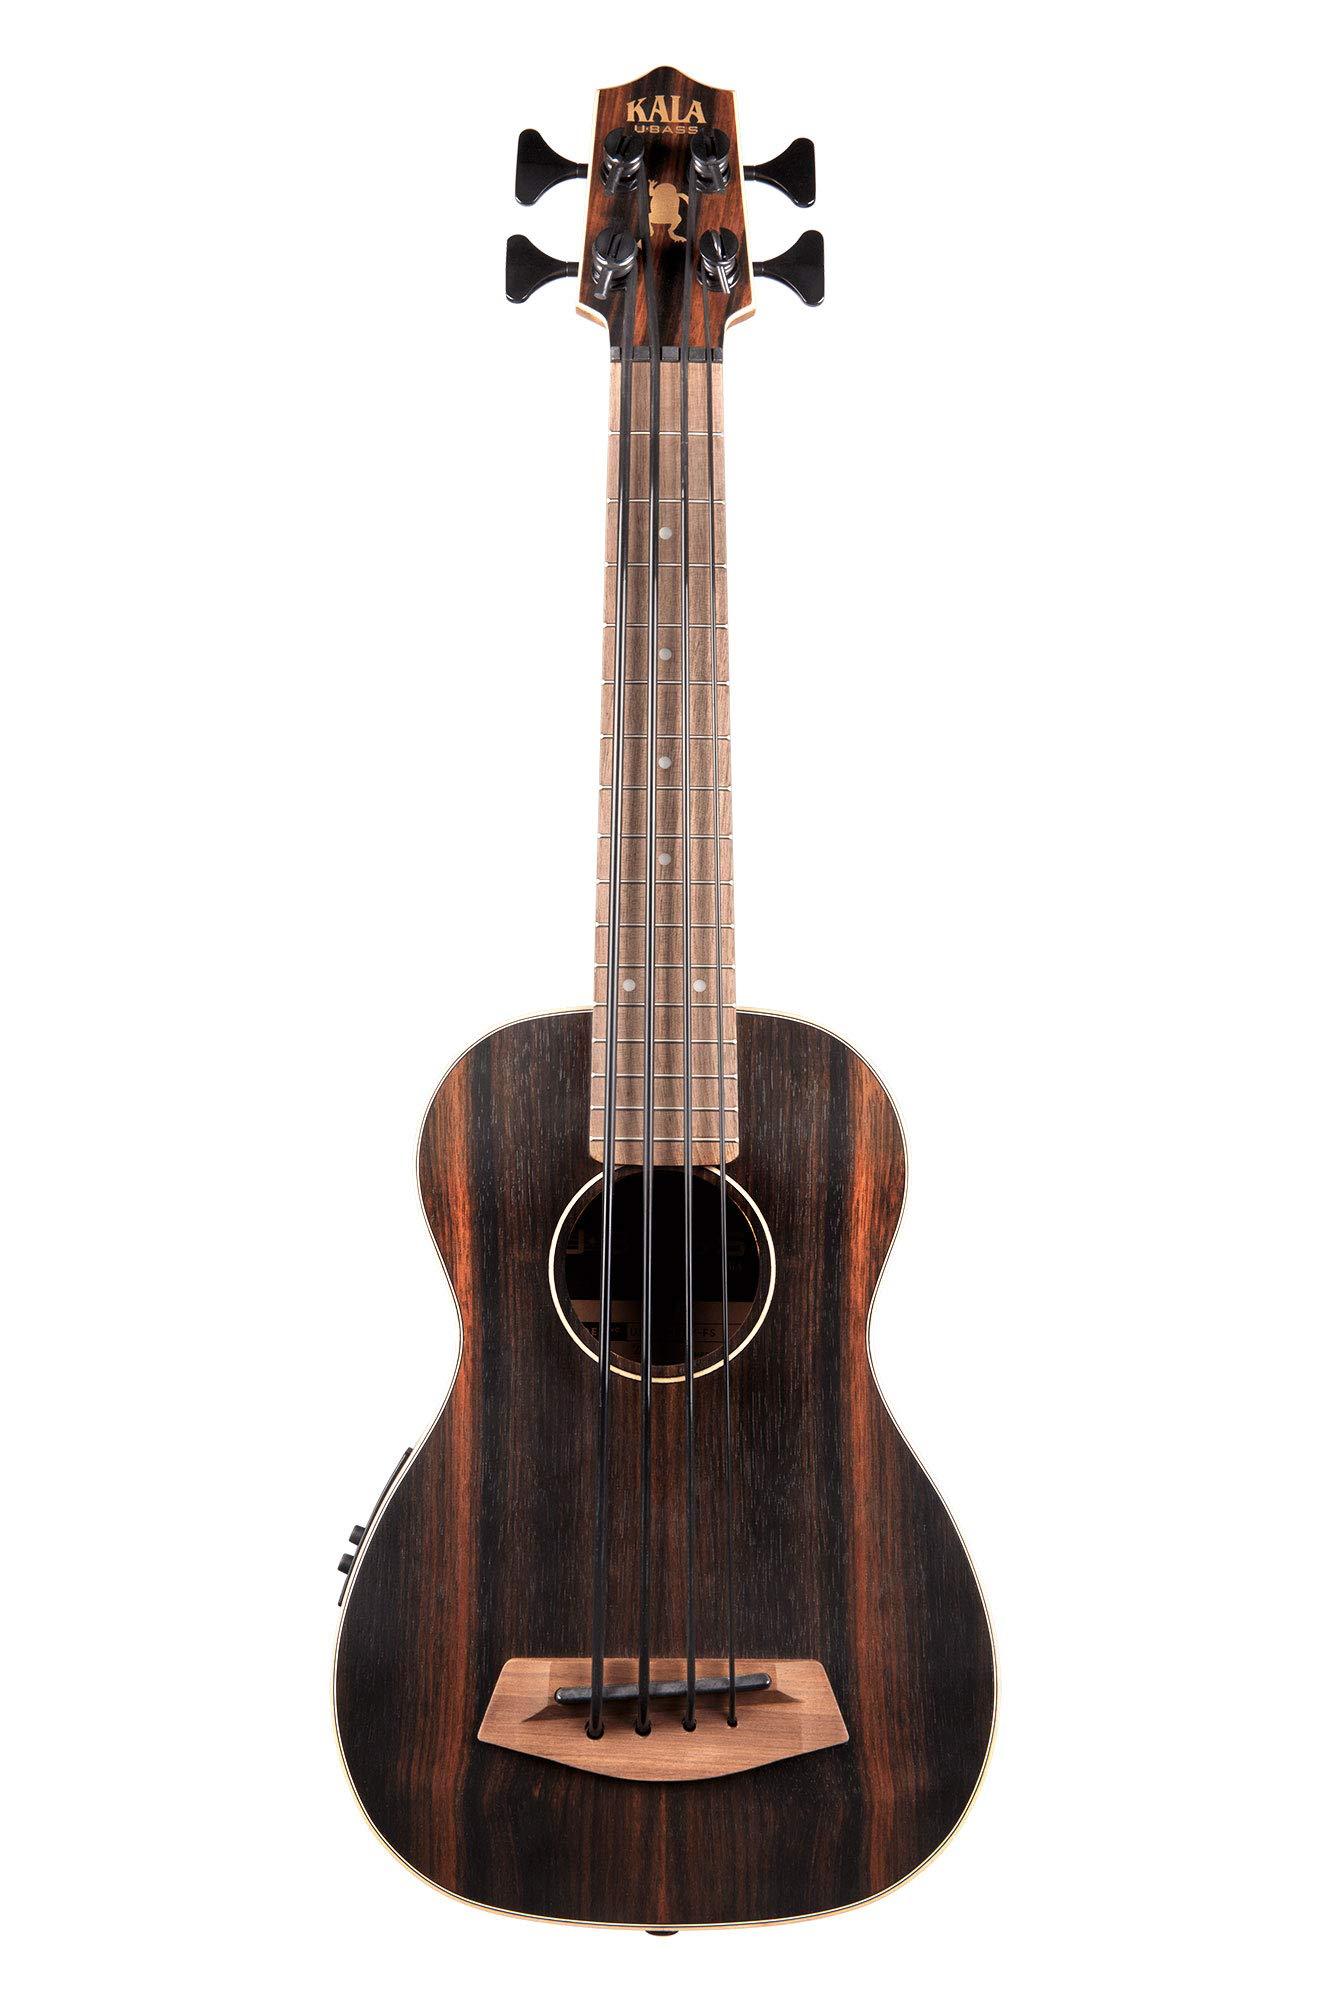 Kala UBASS EBY FS Acoustic Electric Bass Striped Ebony Fretted w Bag, Natural